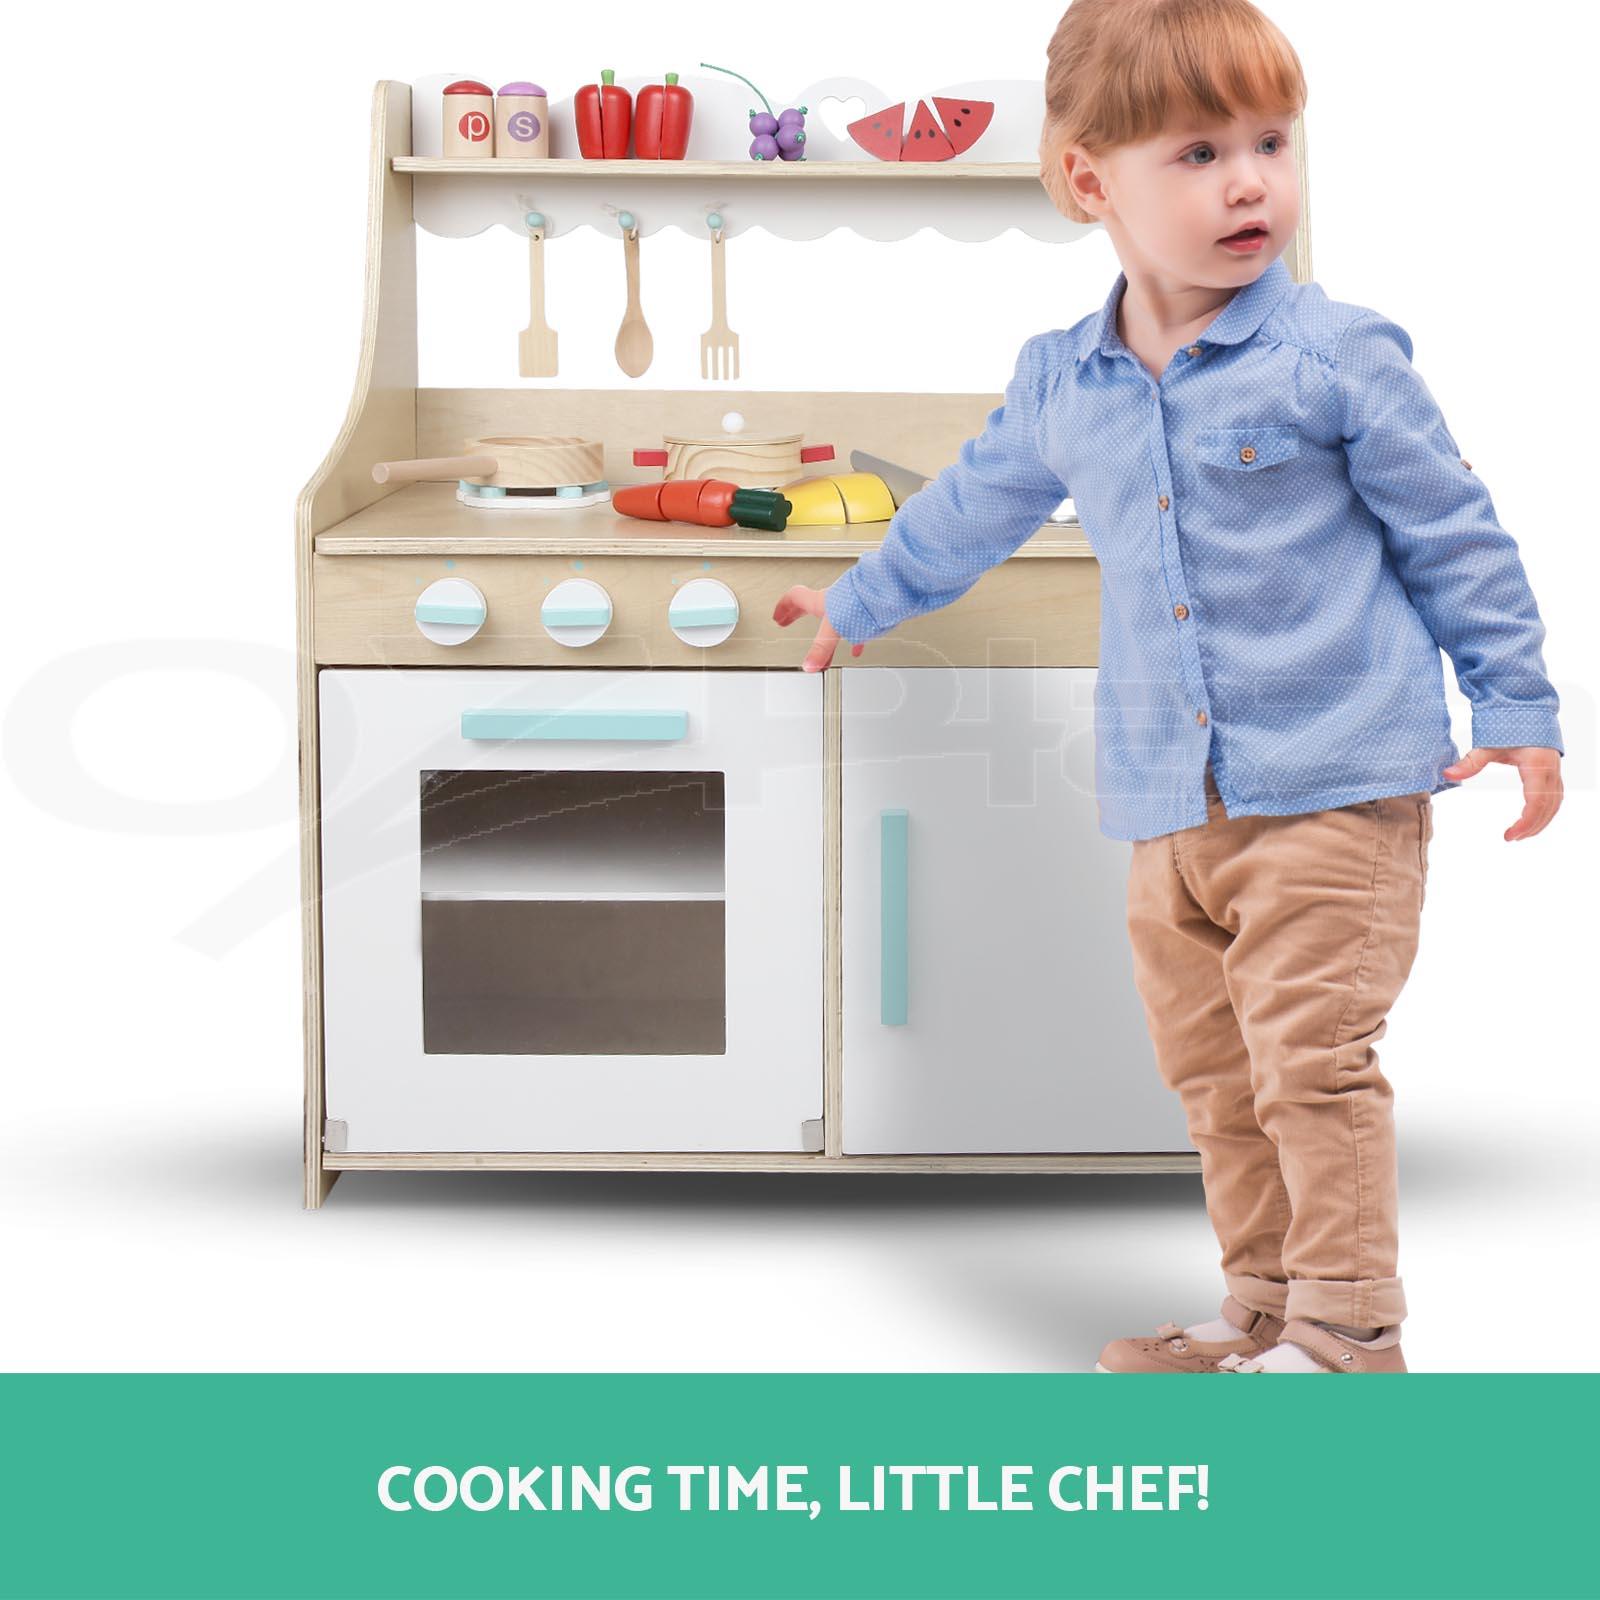 play kitchen for toddler kraftmaid kitchens keezi kids wooden pretend set toy